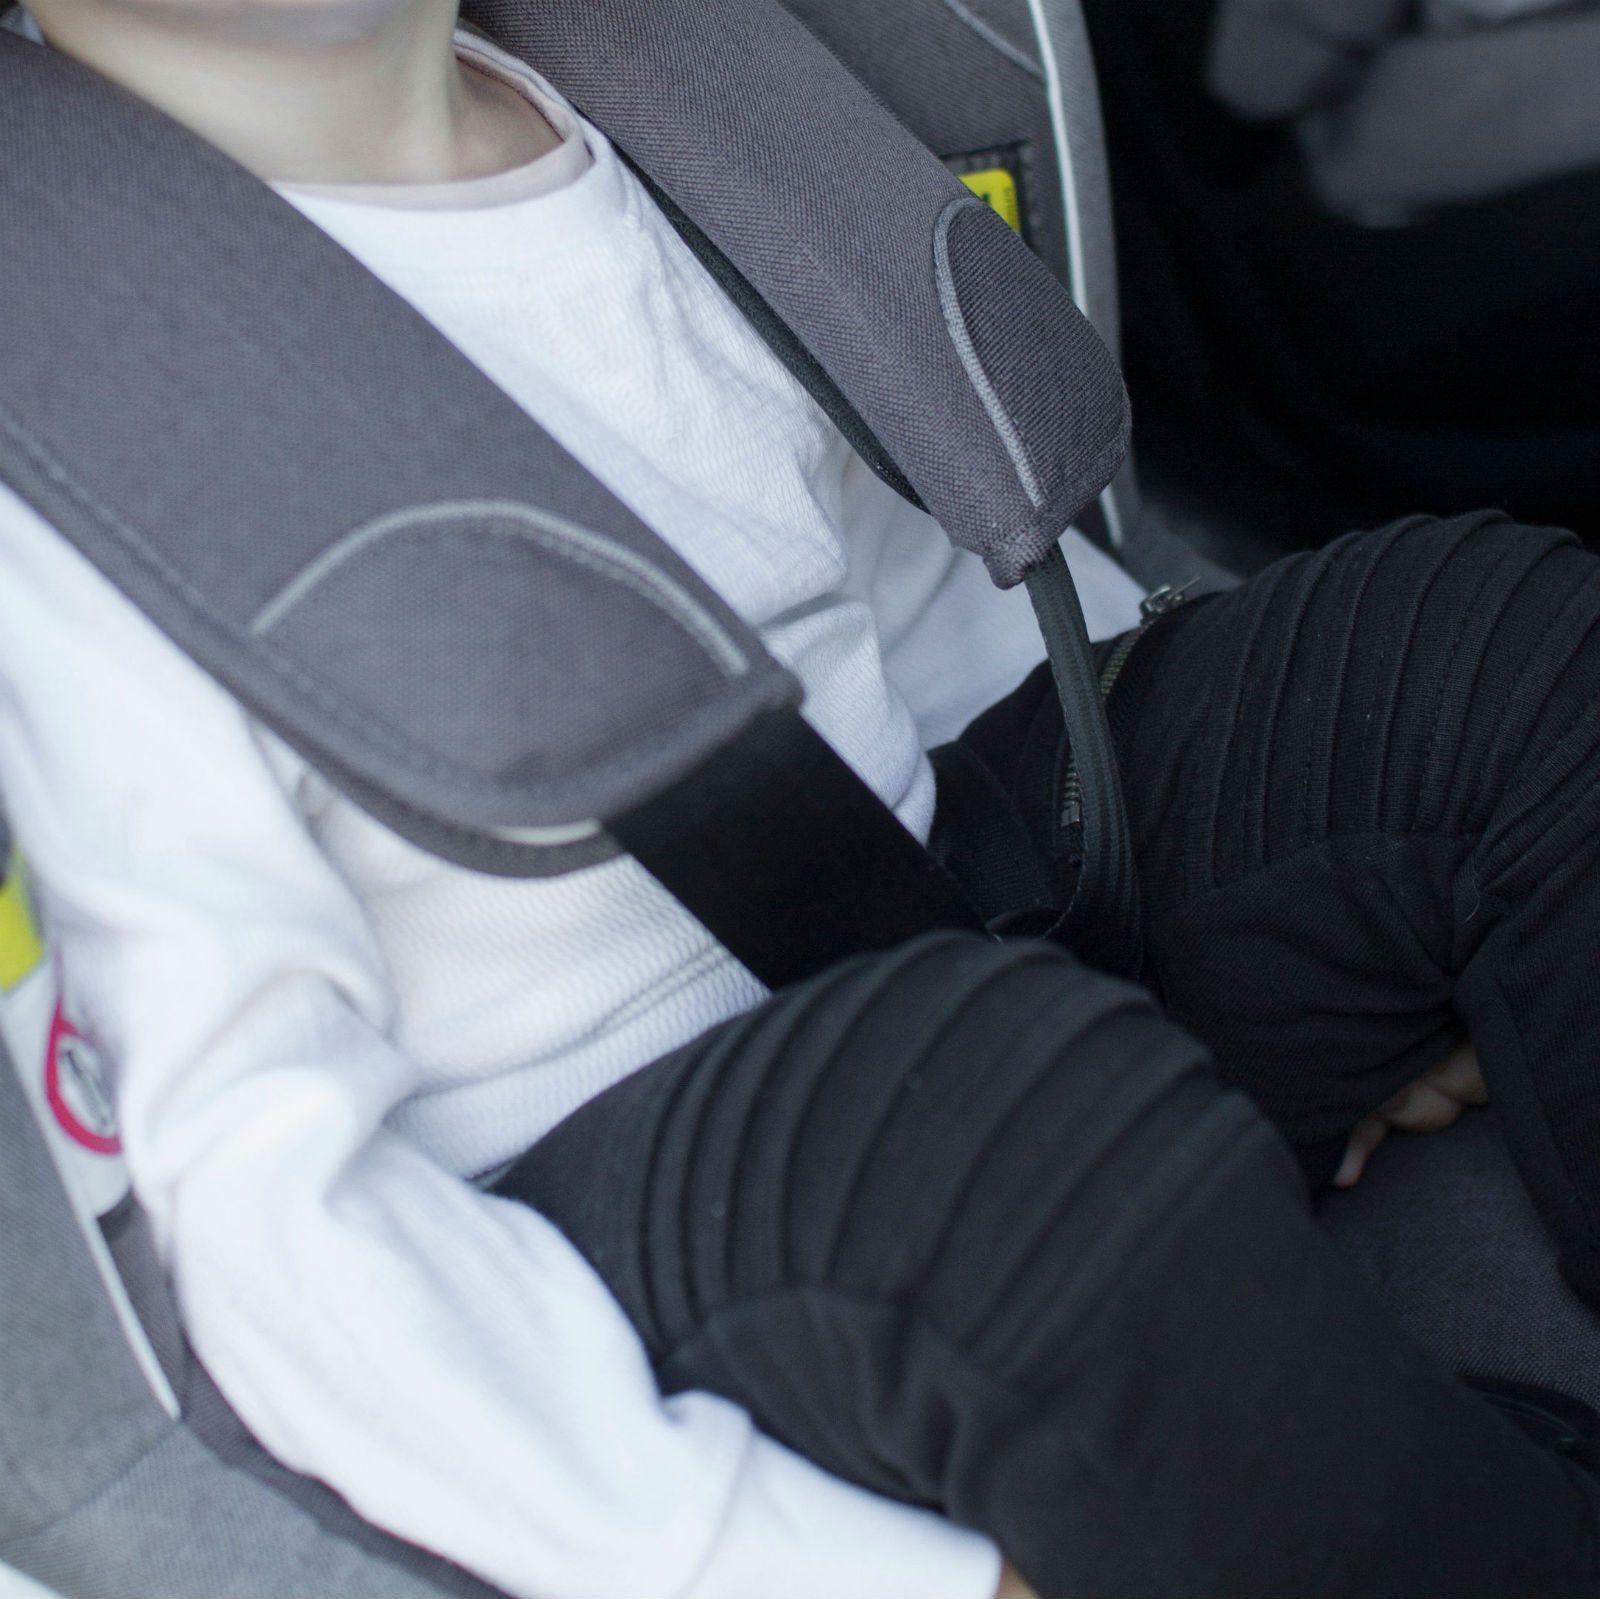 winter jackets in car seats instruction 5